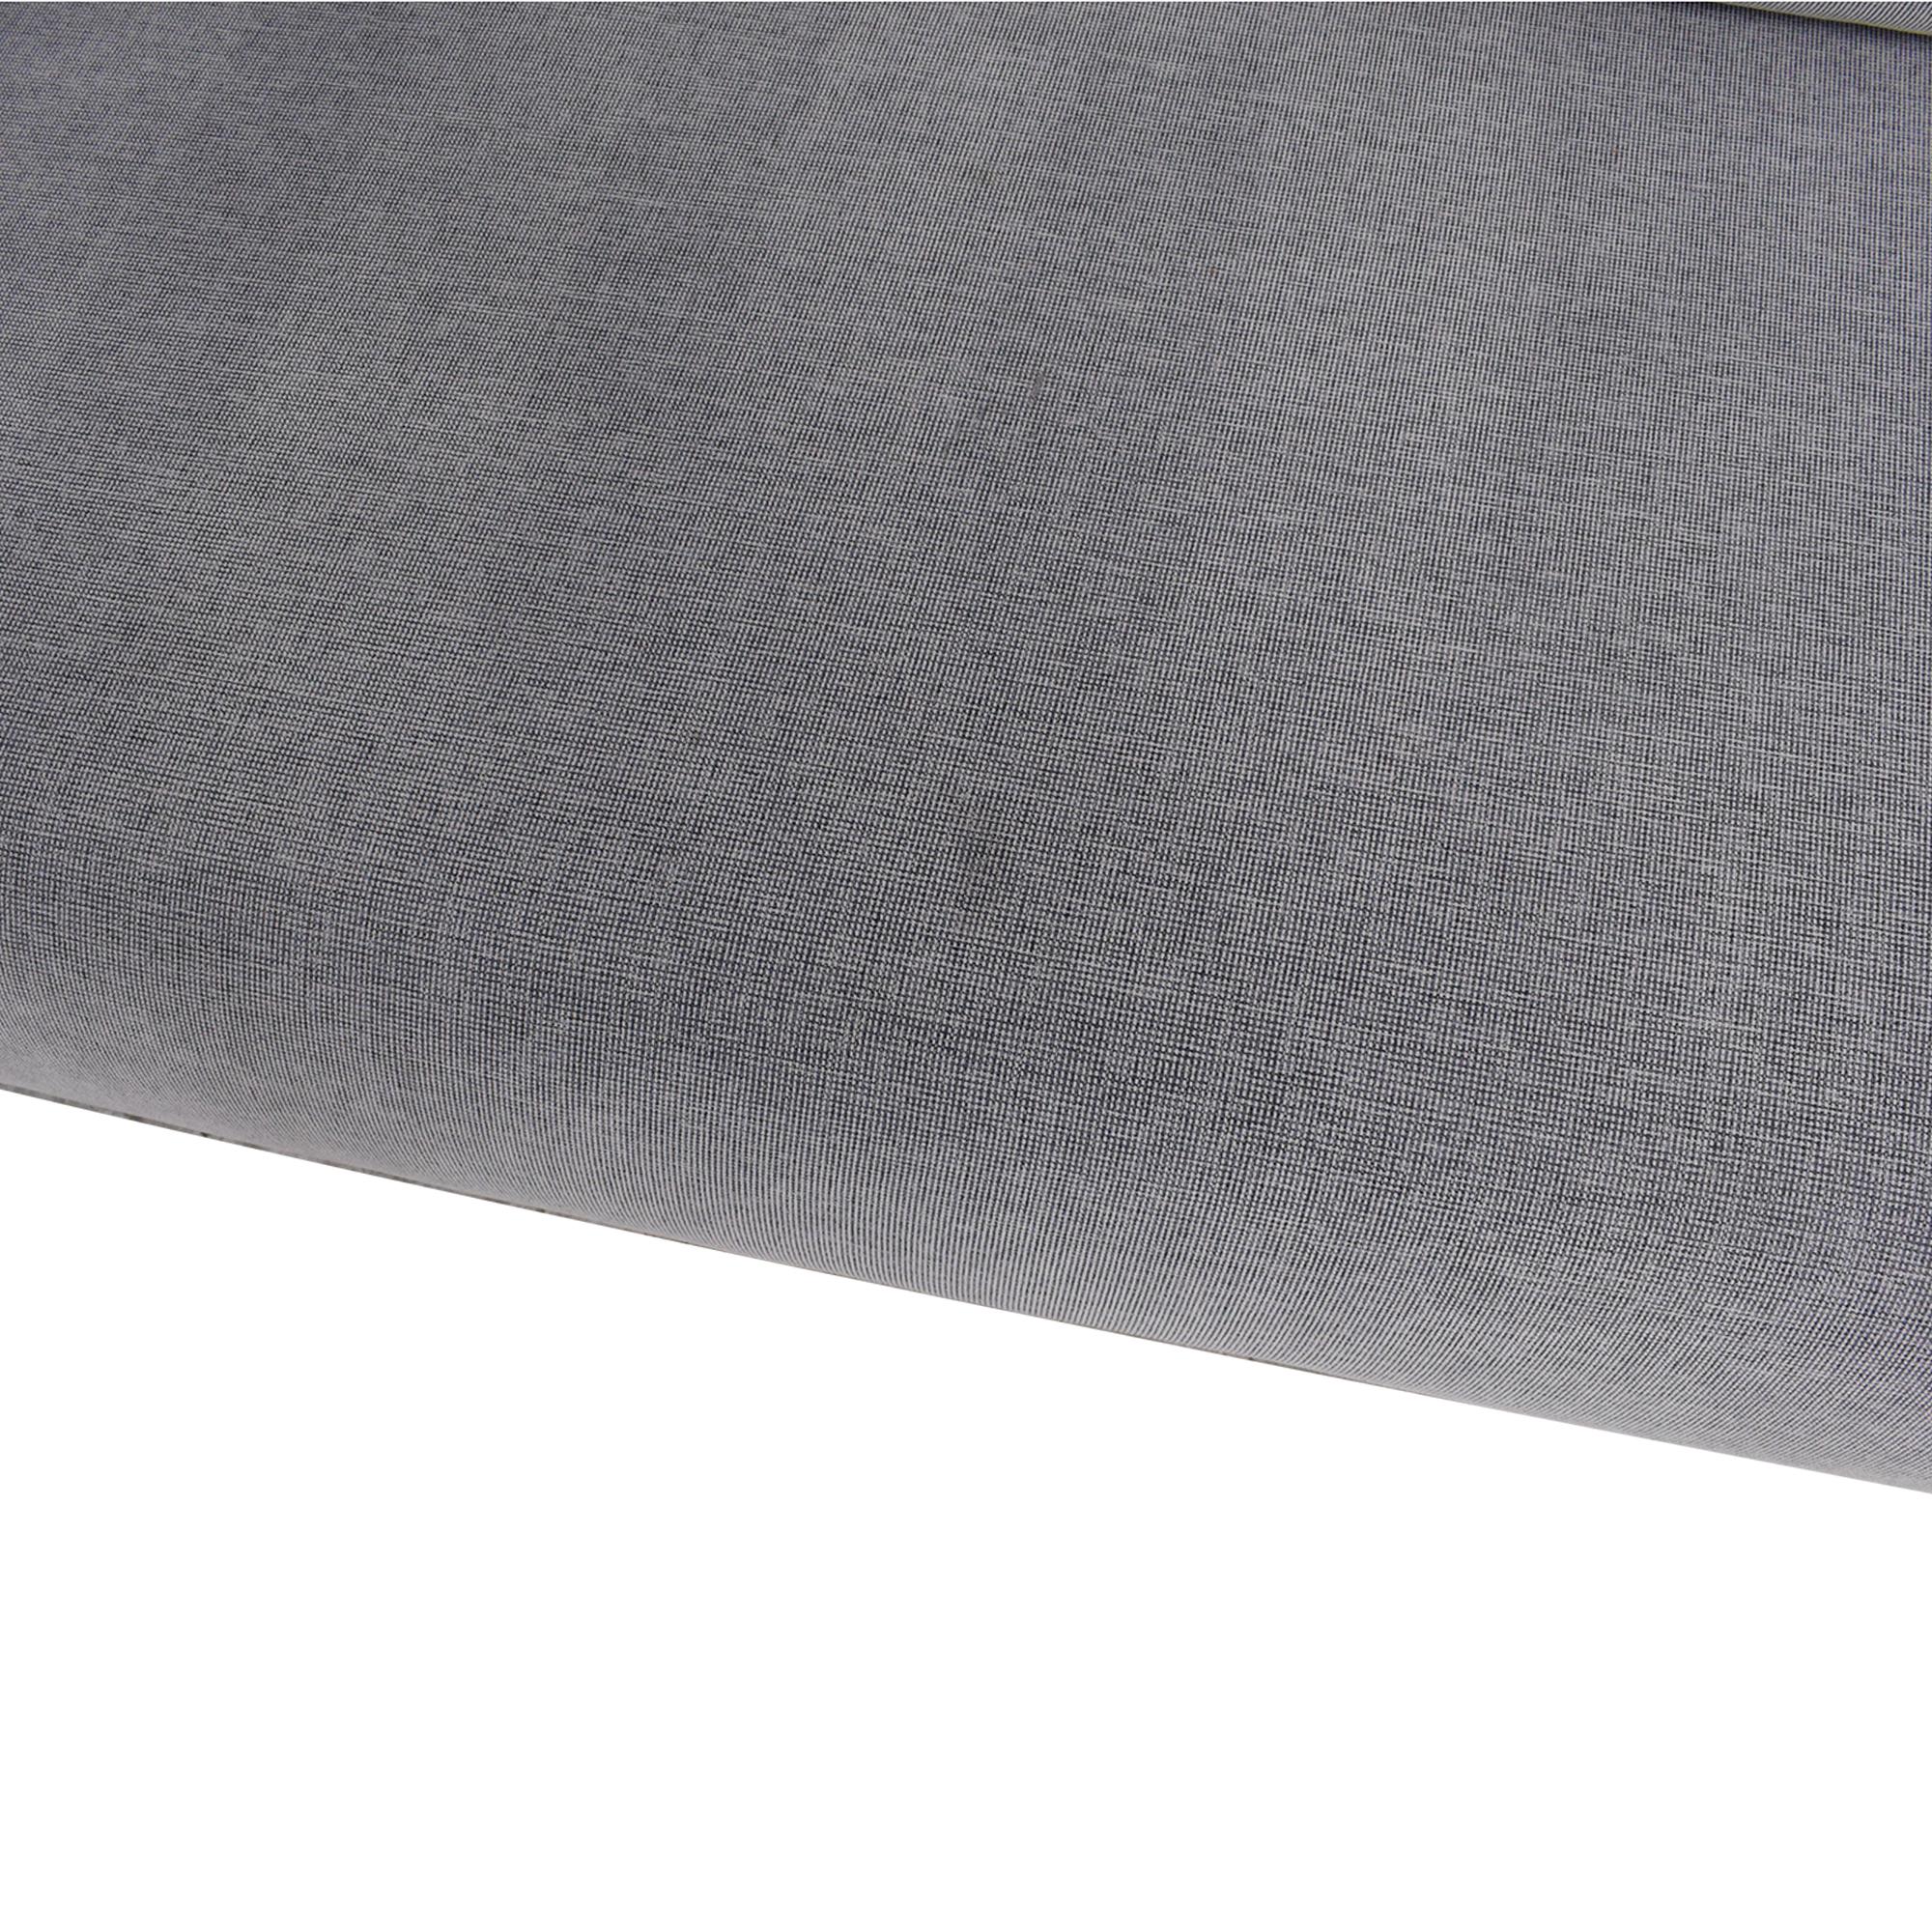 CB2 Tandom Microgrid Sleeper Sofa CB2